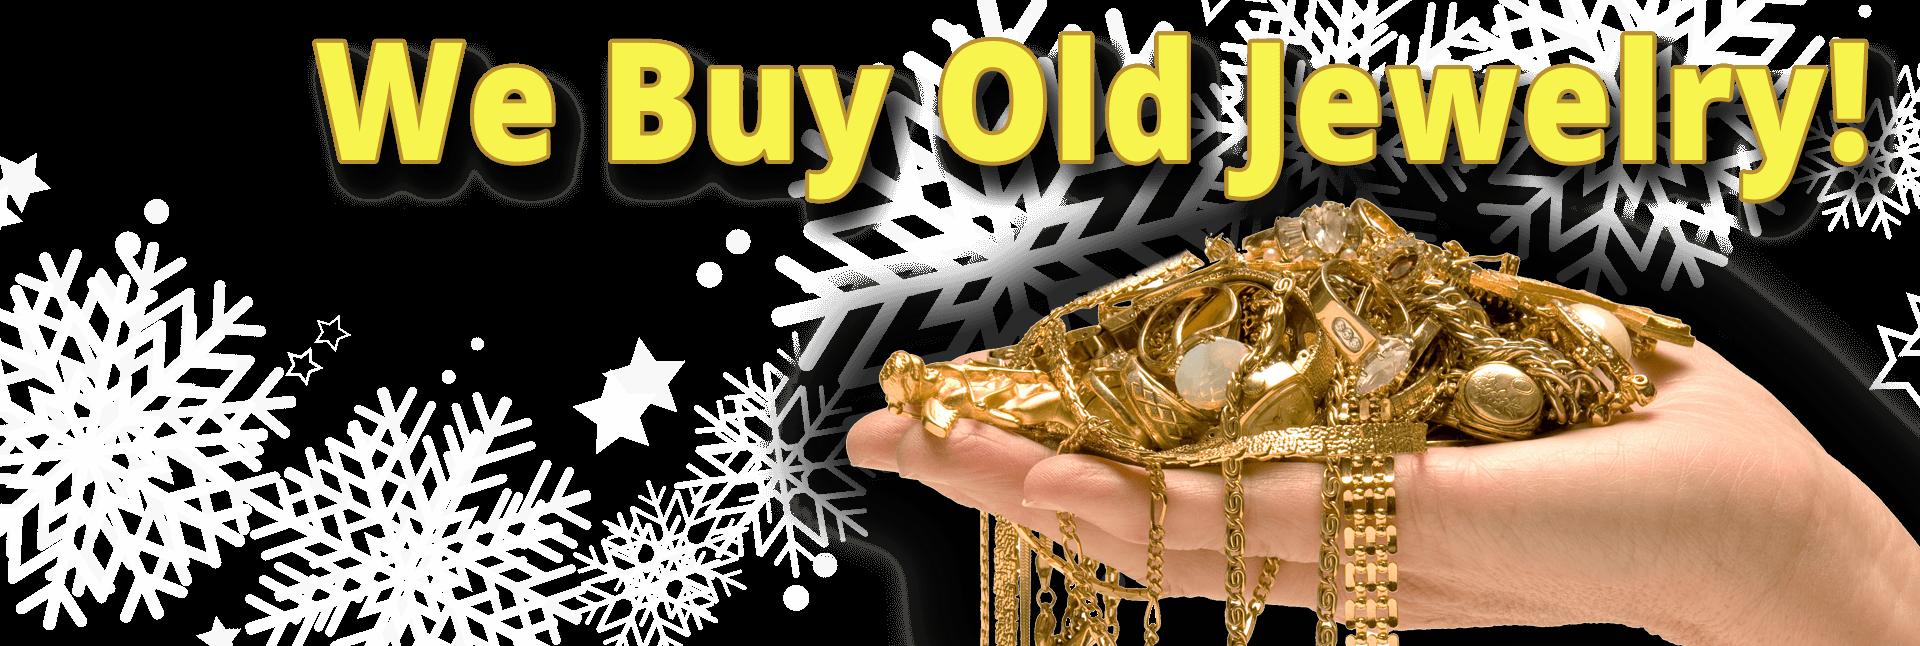 We Buy Old Jewelry